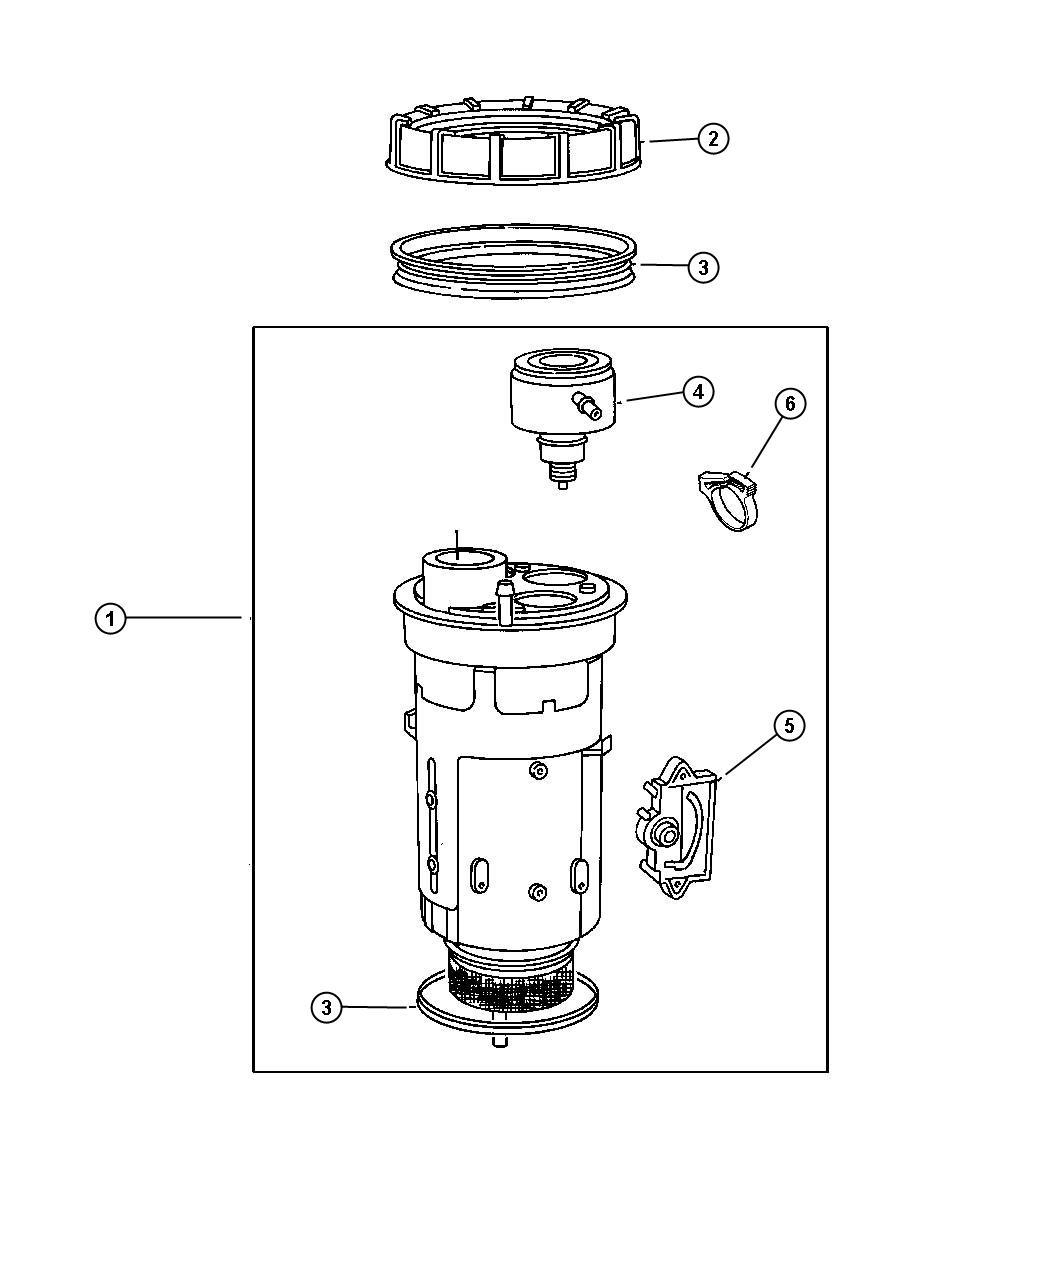 Jeep Grand Cherokee Filter Fuel Sunscreenlon